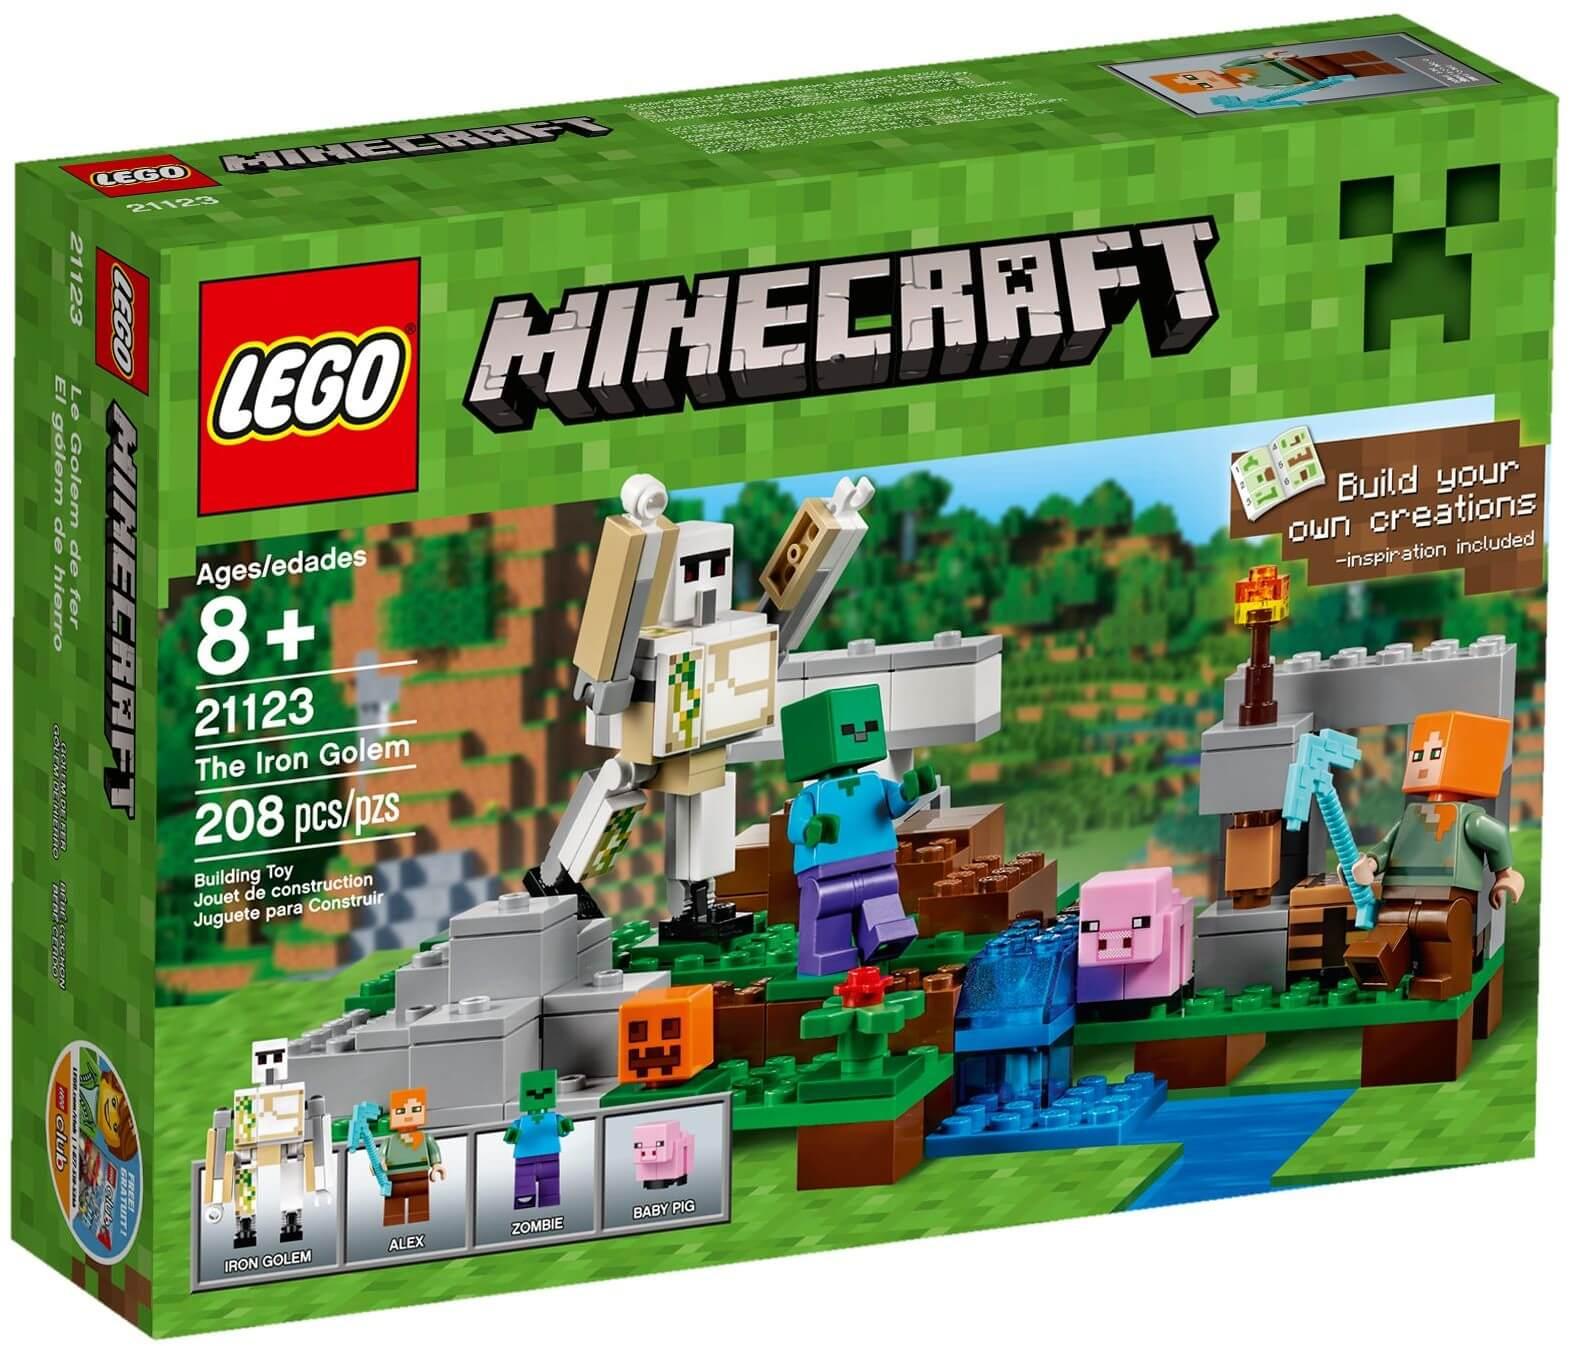 Mua đồ chơi LEGO 21123 - LEGO Minecraft 21123 - Golem Sắt Khổng Lồ của Alex (LEGO Minecraft The Iron Golem 21123)